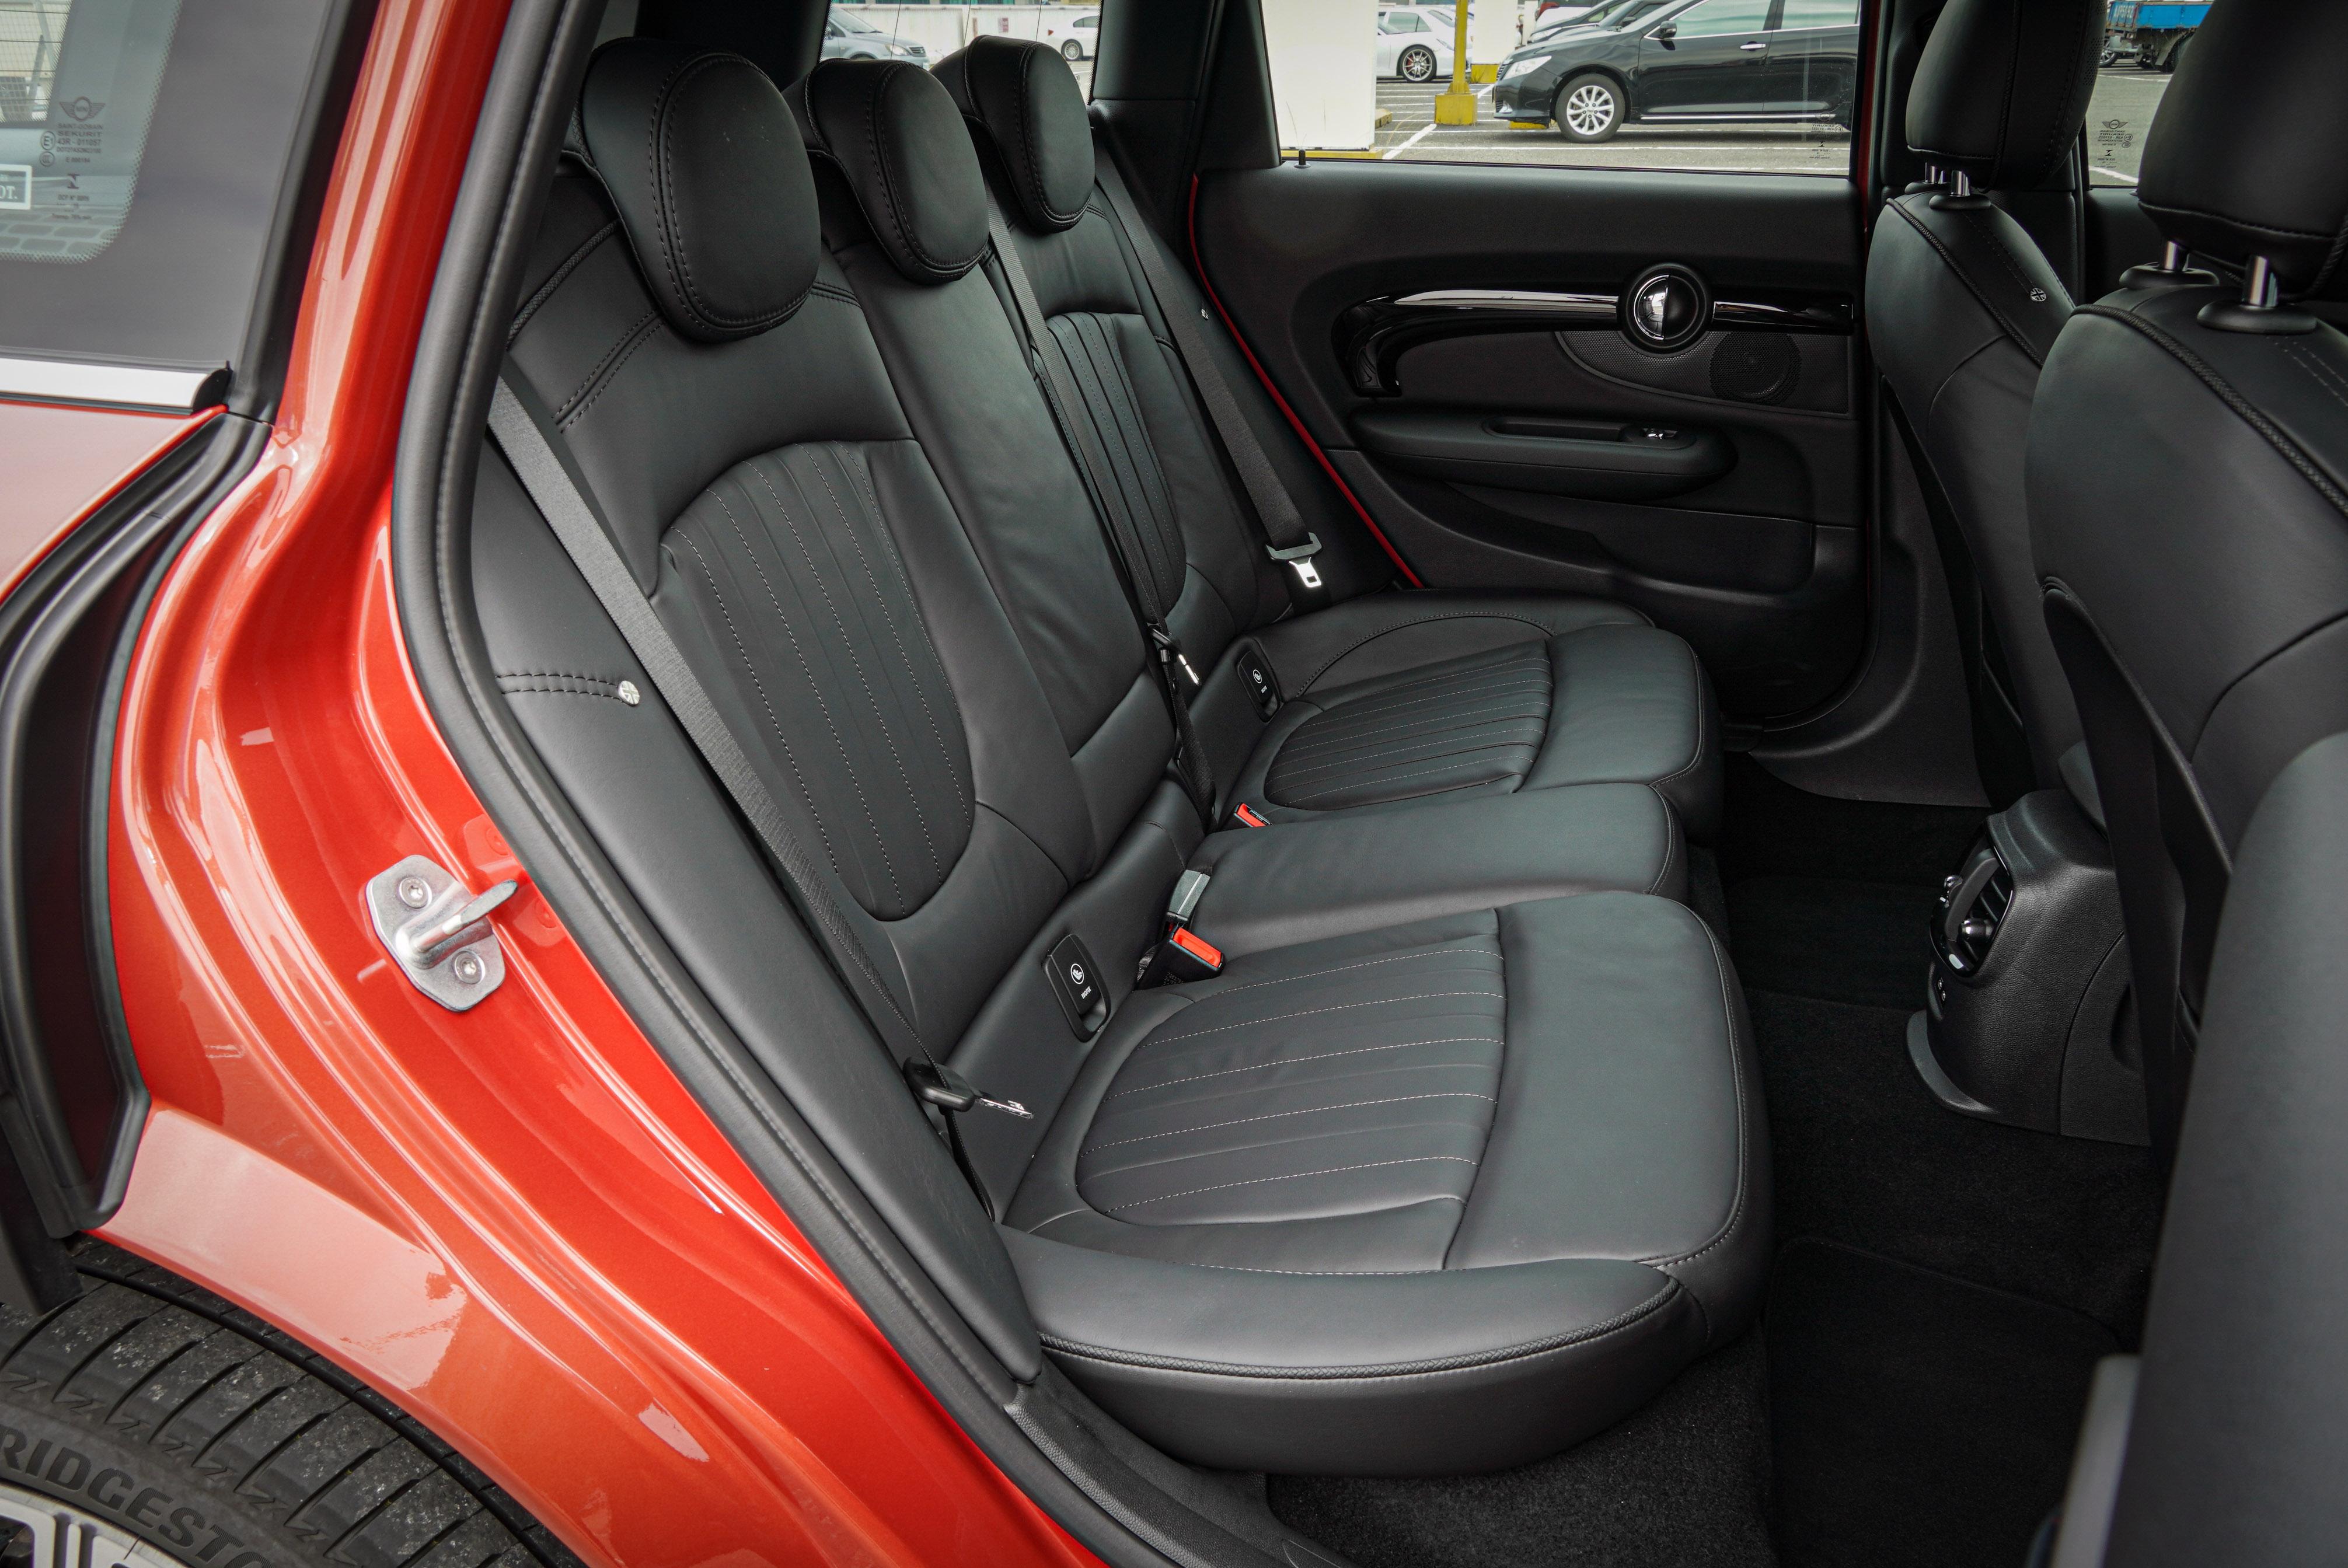 Clubman 後座腿部空間對多數成人來說算充裕,頭部空間 1441 mm 的車高而較為侷促。